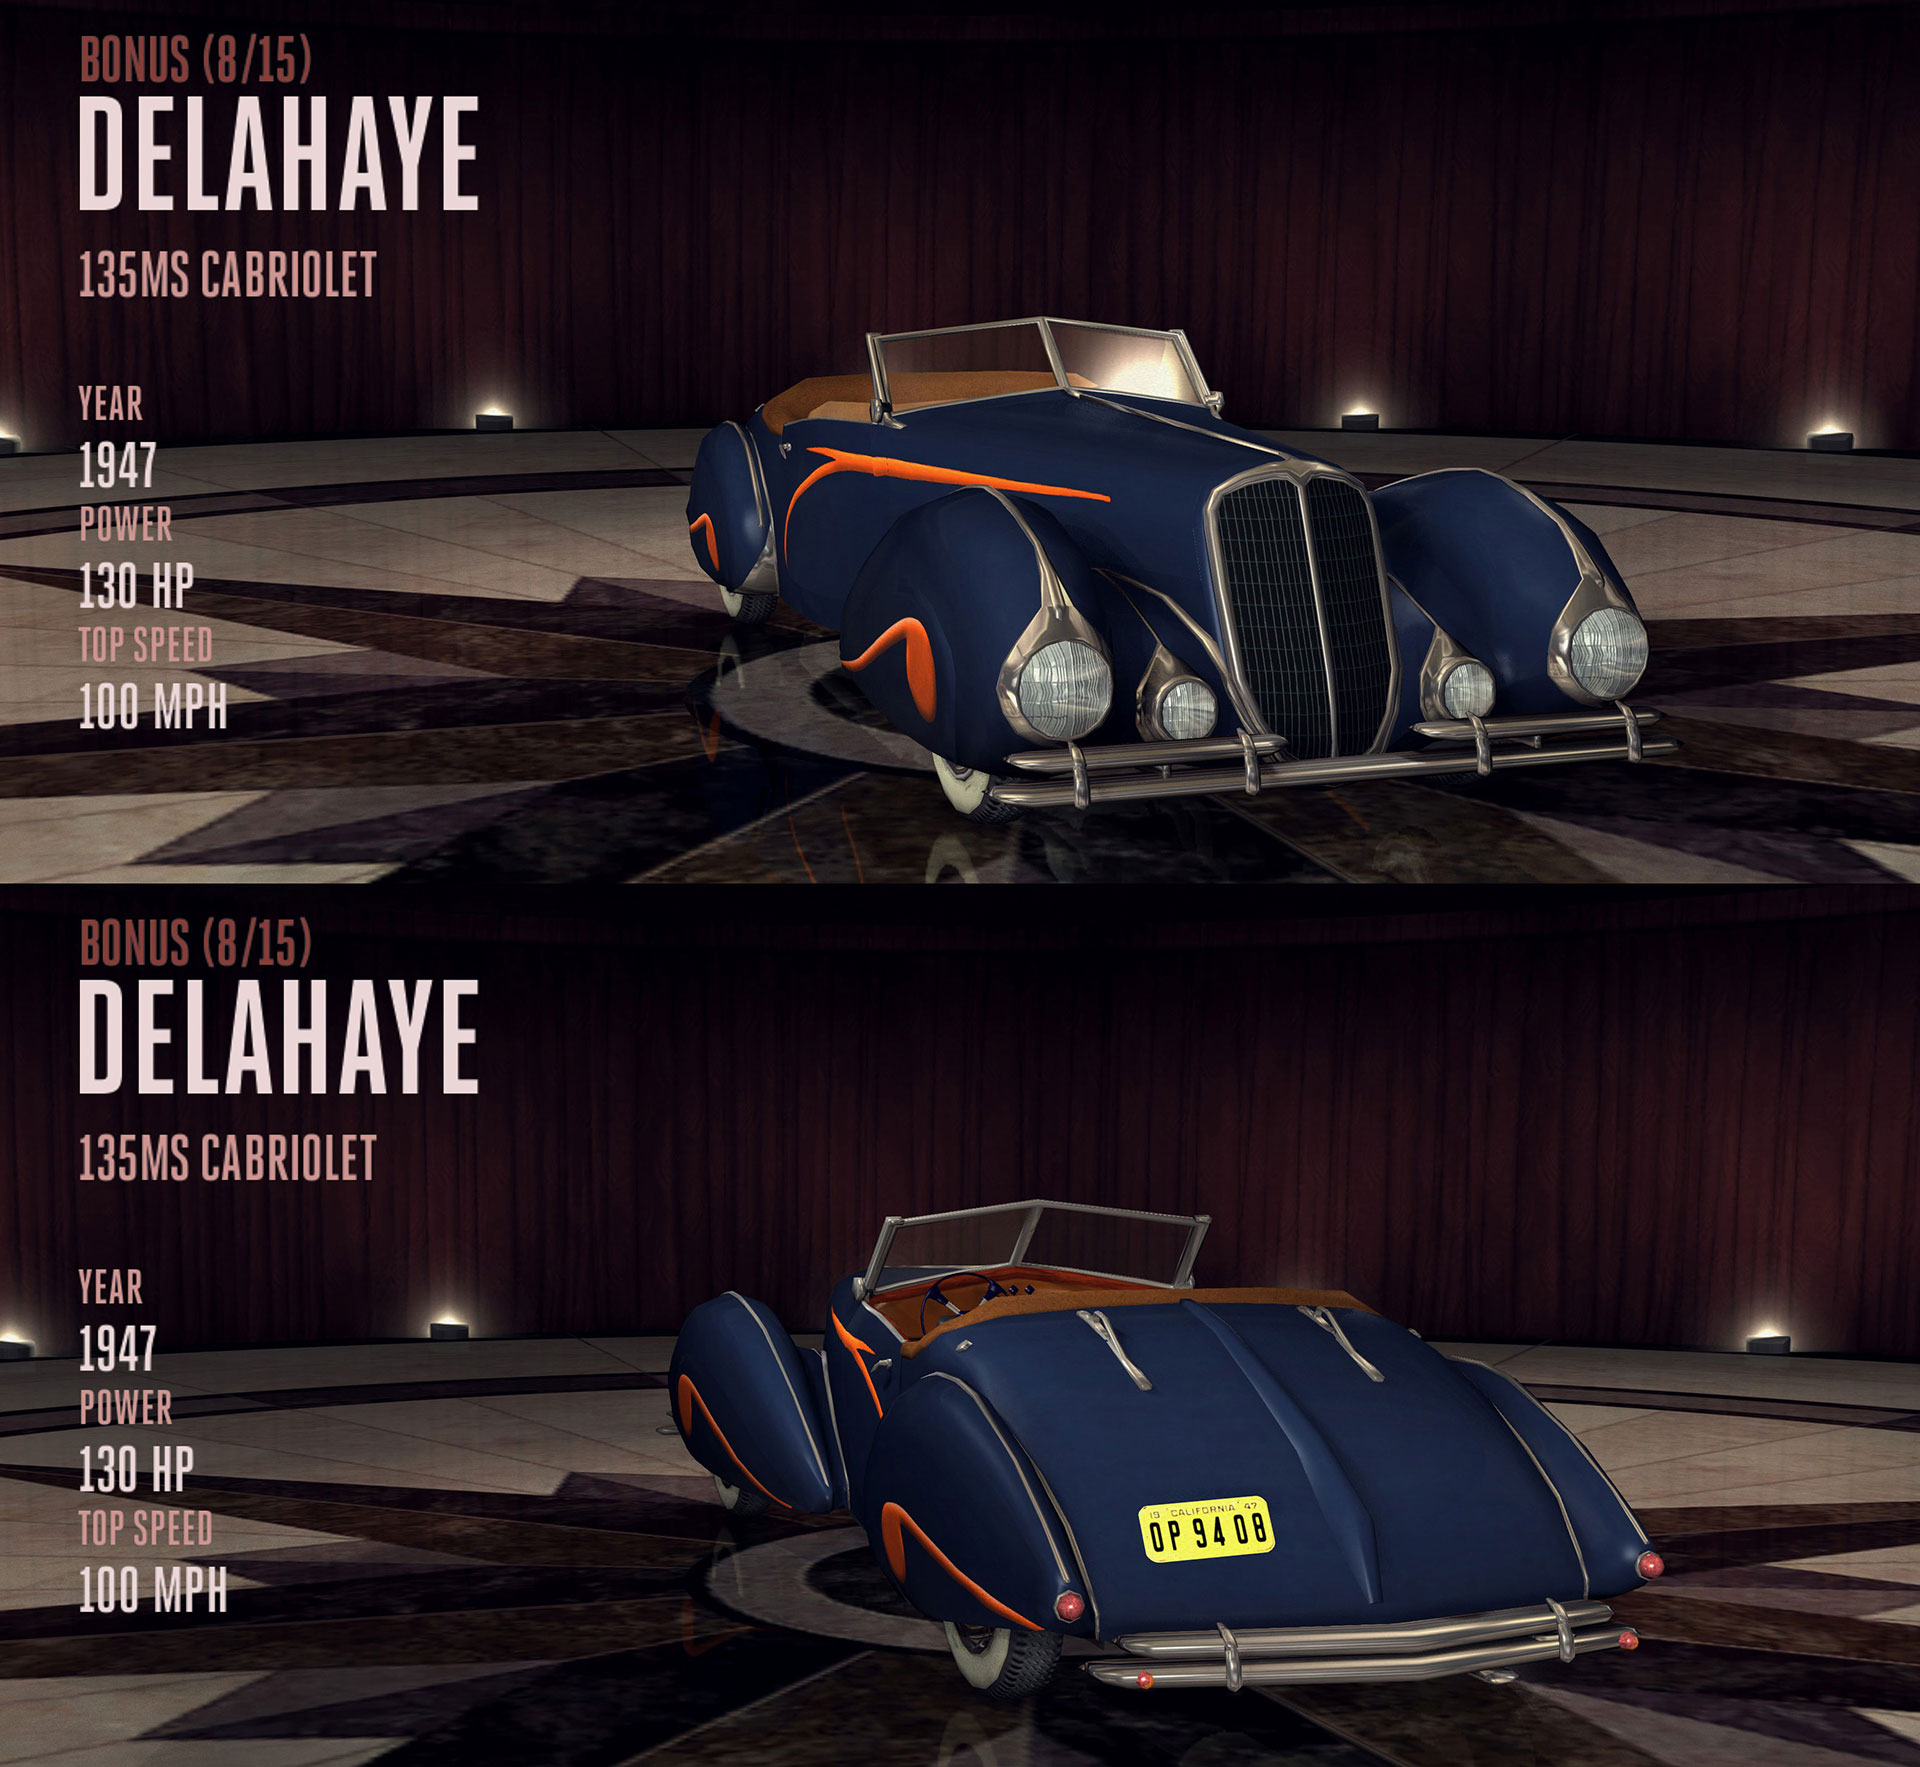 Archivo:1947-delahaye-135ms-cabriolet.jpg